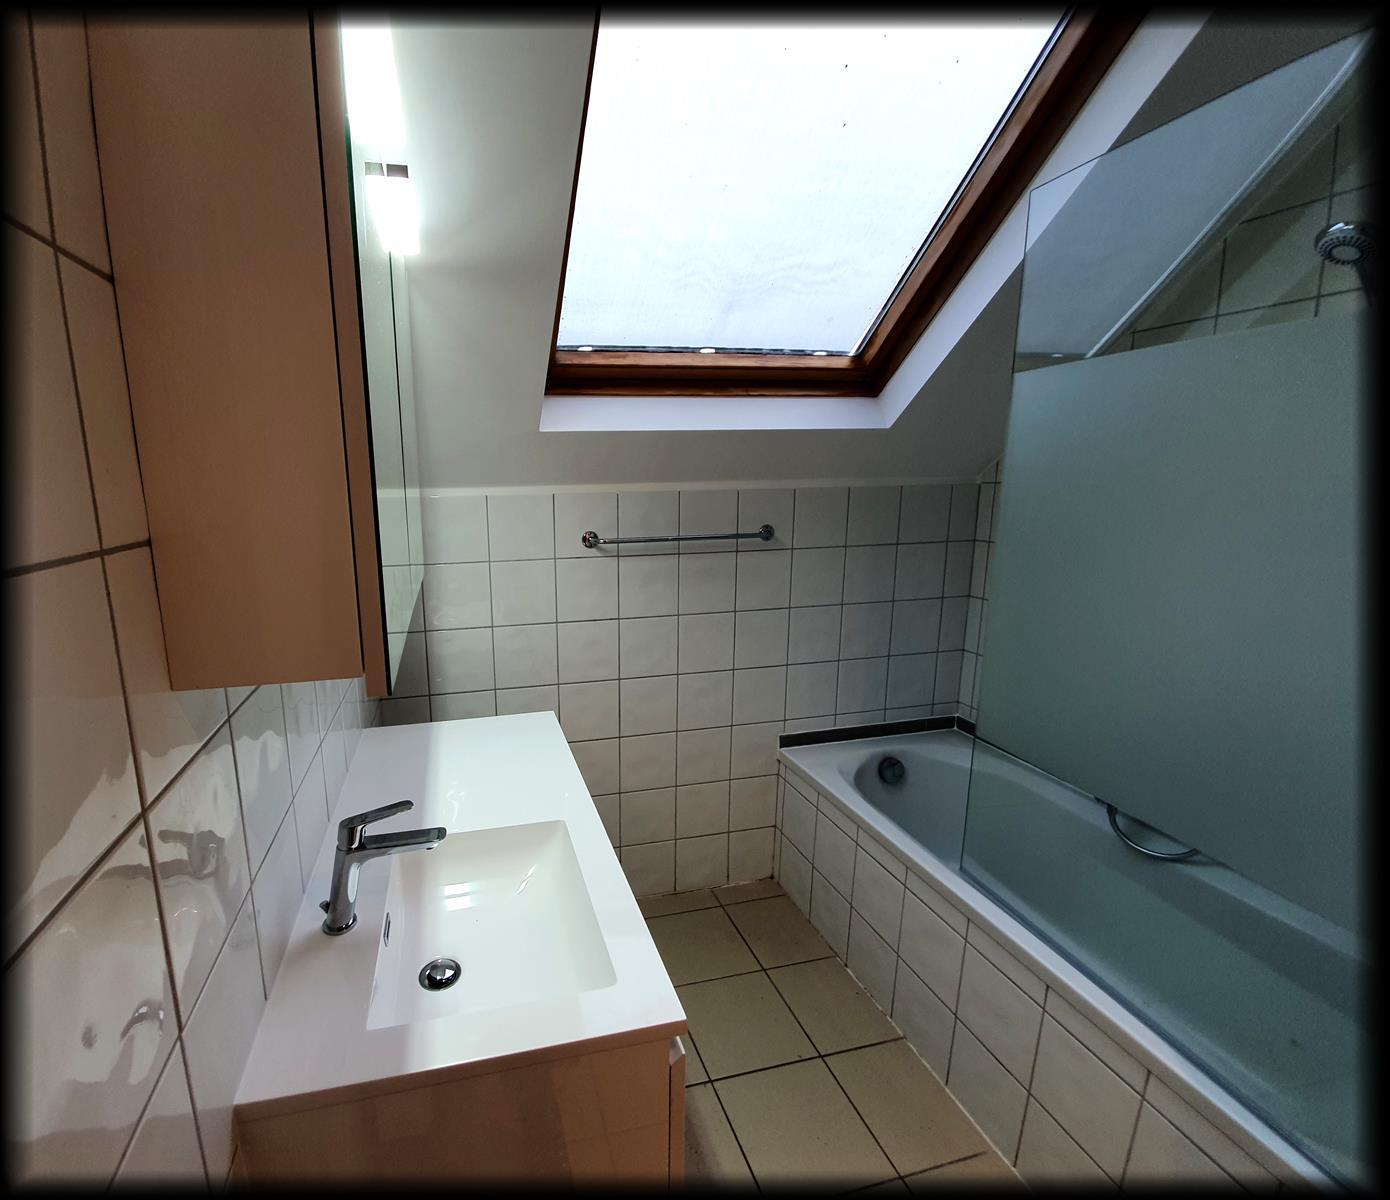 Appartement - Chaumont-Gistoux - #4226214-9